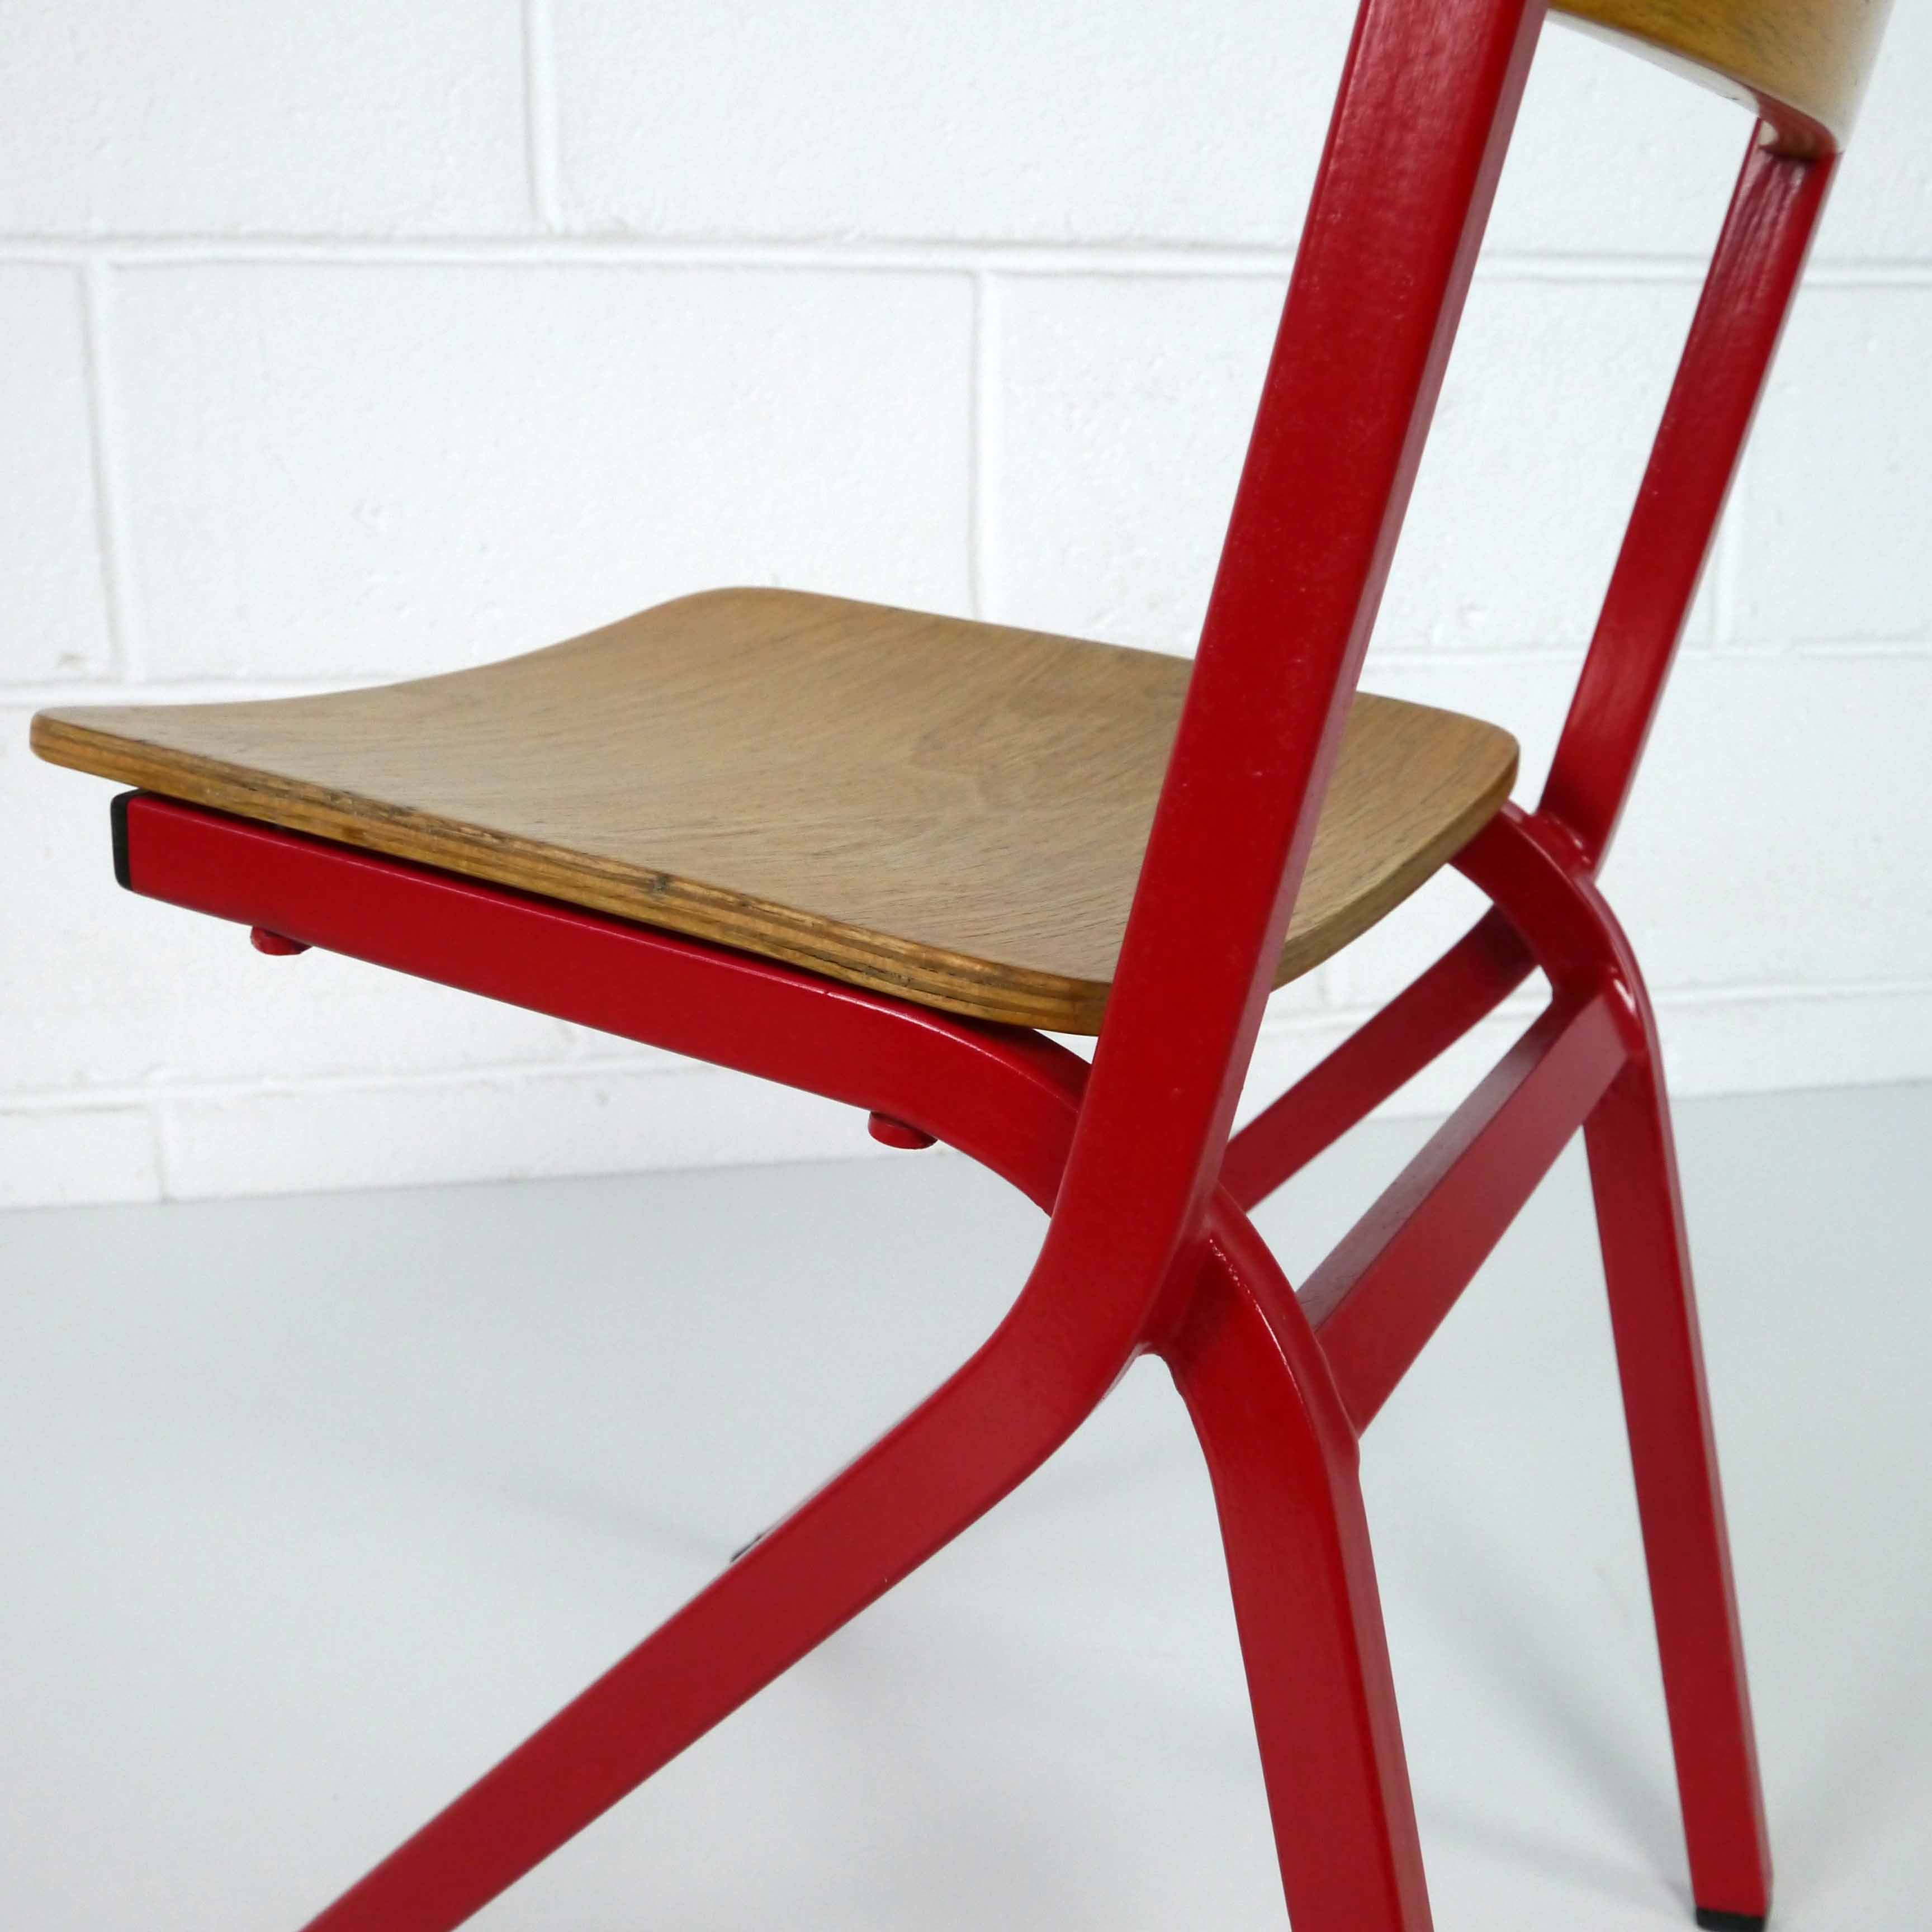 Bureau Rougeamp; Bureau Chaise Design Design Rougeamp; Chaise Design nPw8O0kX